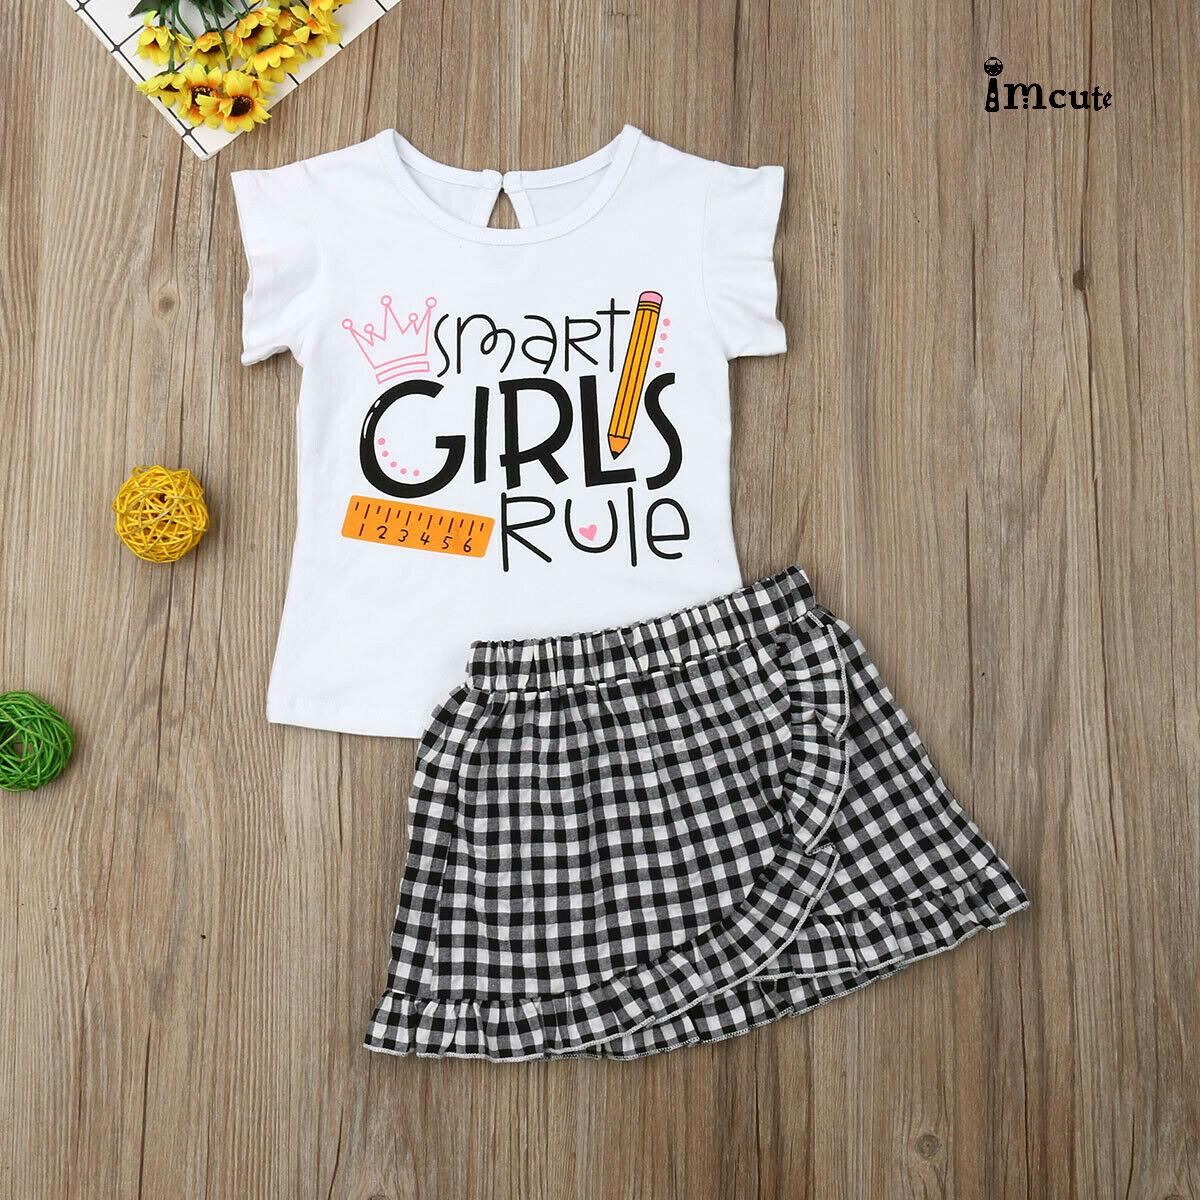 UK 2PCS Toddler Kids Baby Girls Dress Outfits T Shirt Tops Short Skirt Clothes